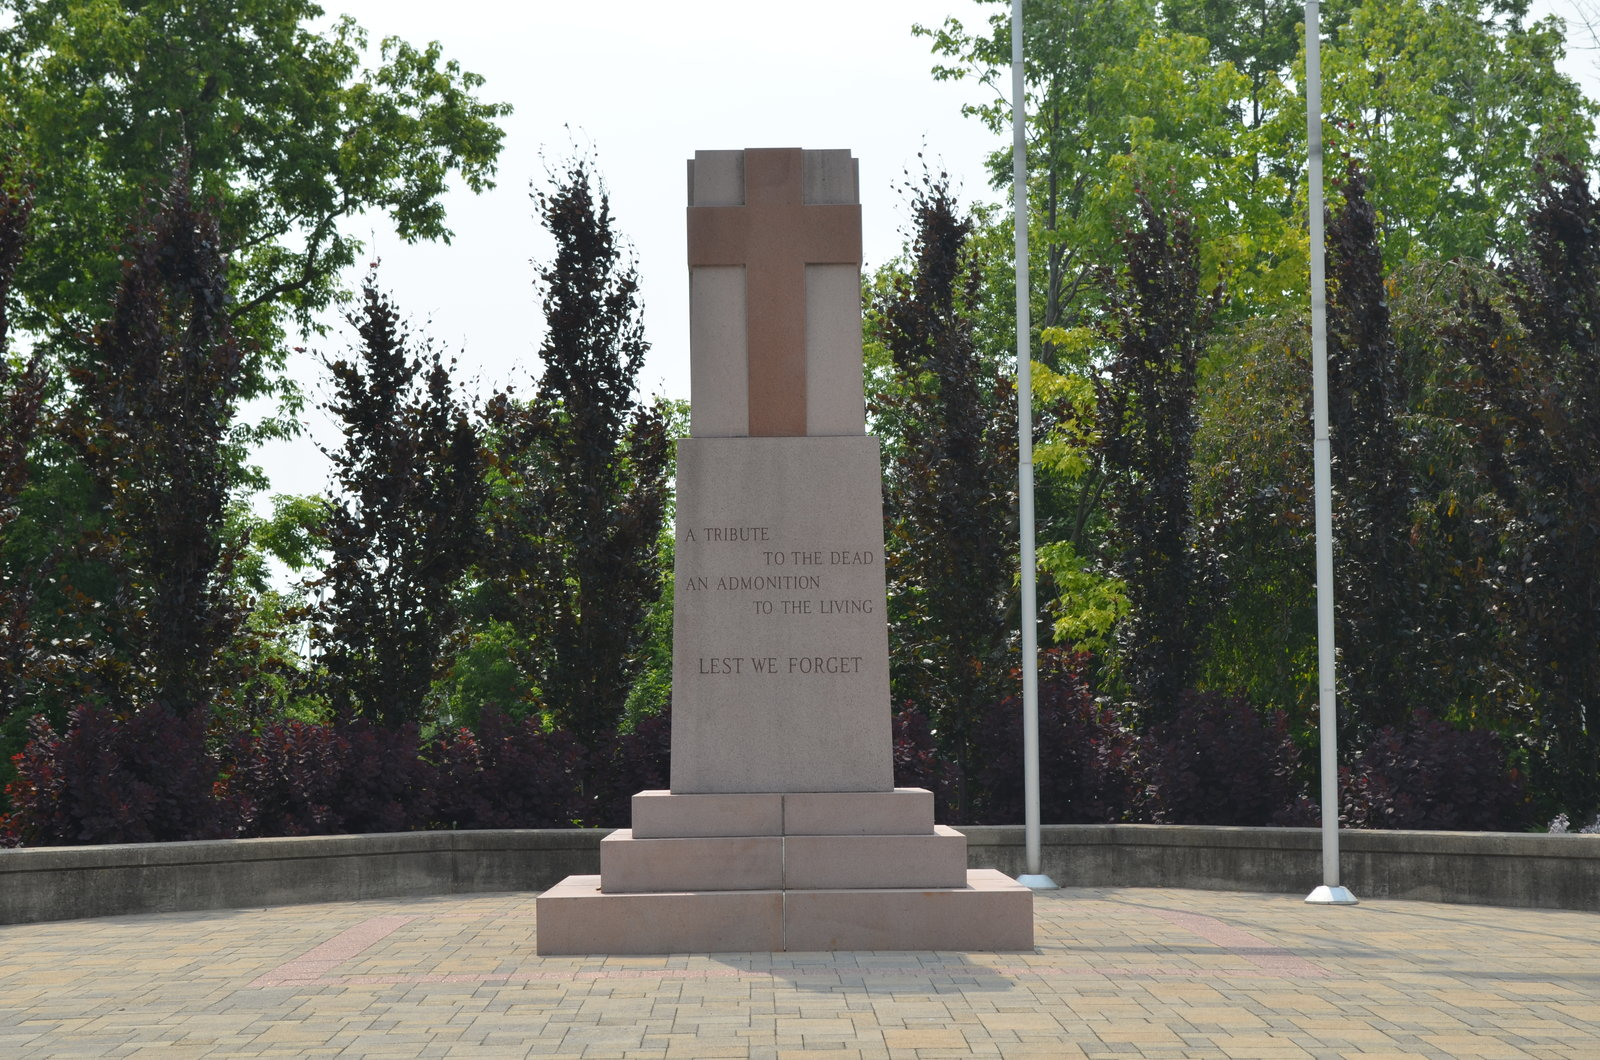 Cenotaph at Chris Vokes Memorial Park